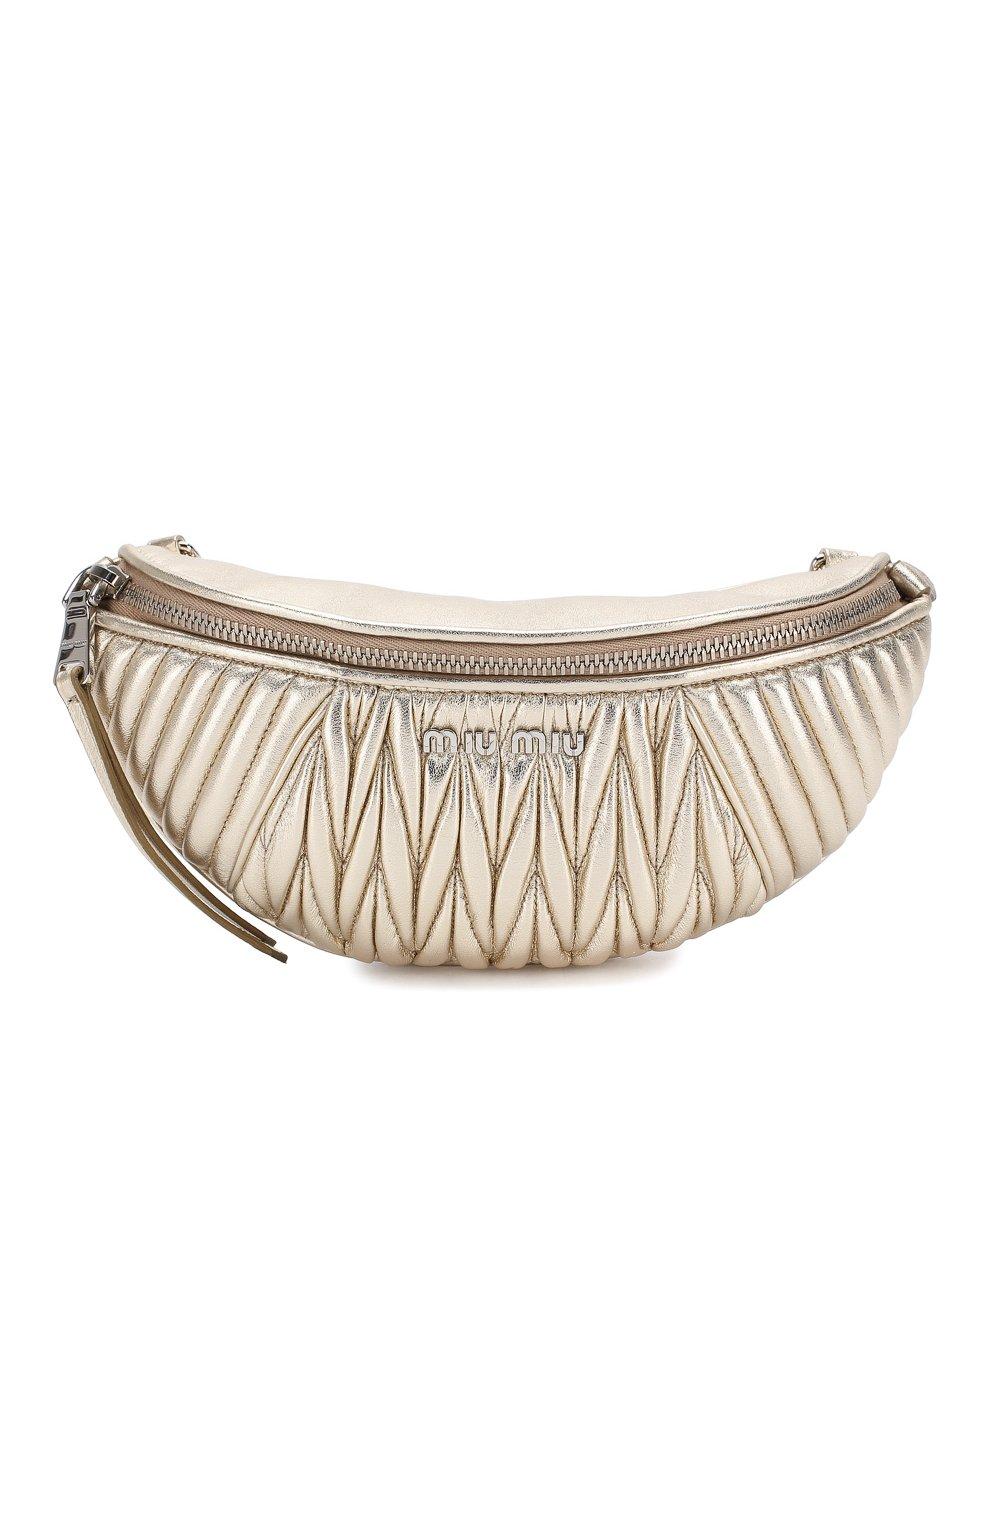 Женская поясная сумка  MIU MIU серебряного цвета, арт. 5BL010-N88-F0PLI-OOO | Фото 1